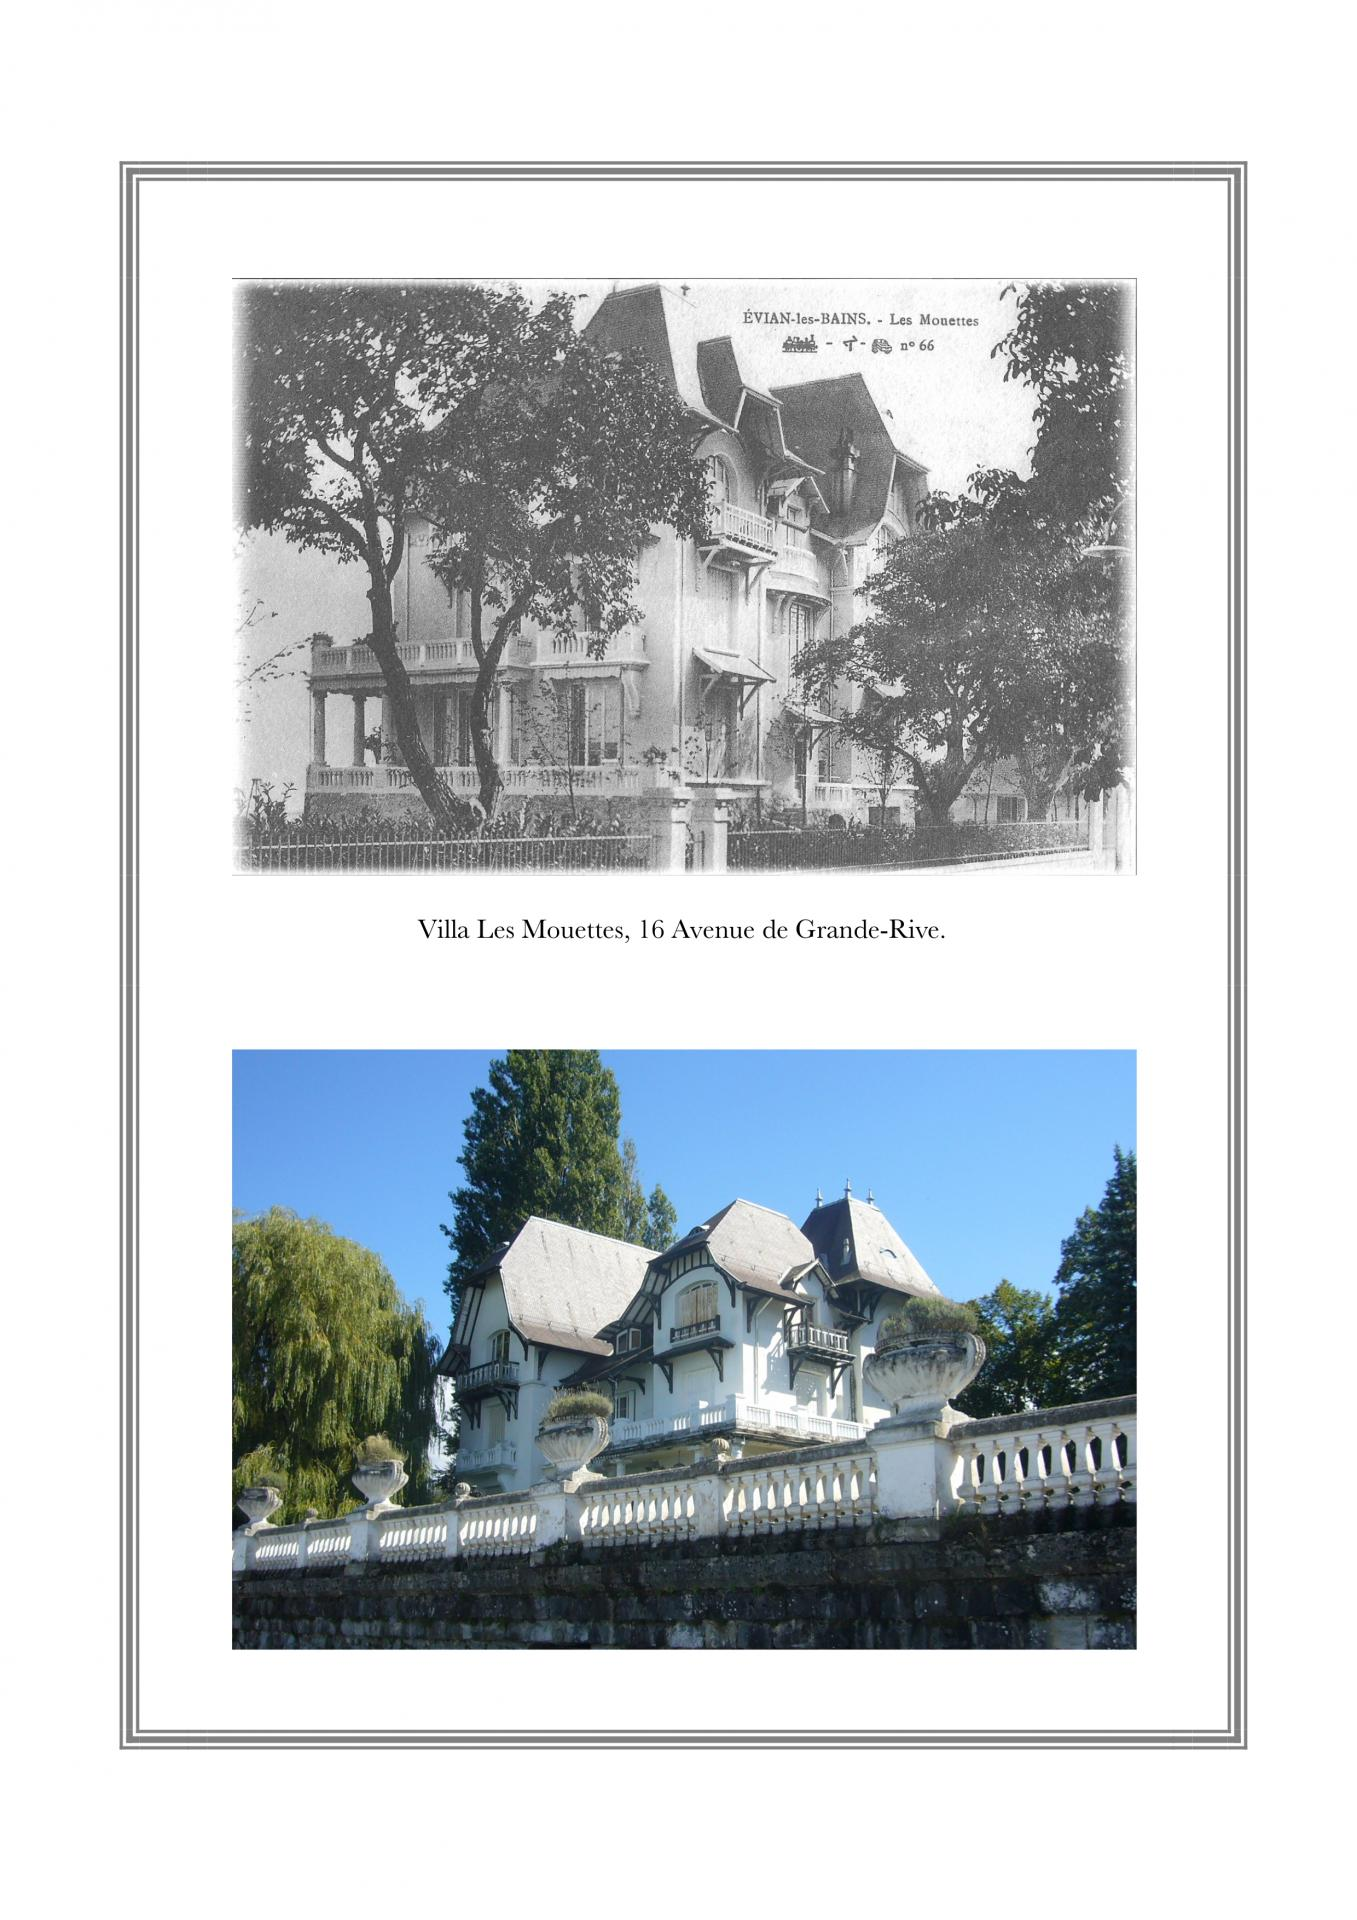 Villa Les Mouettes, 16 avenue de Grande-Rive